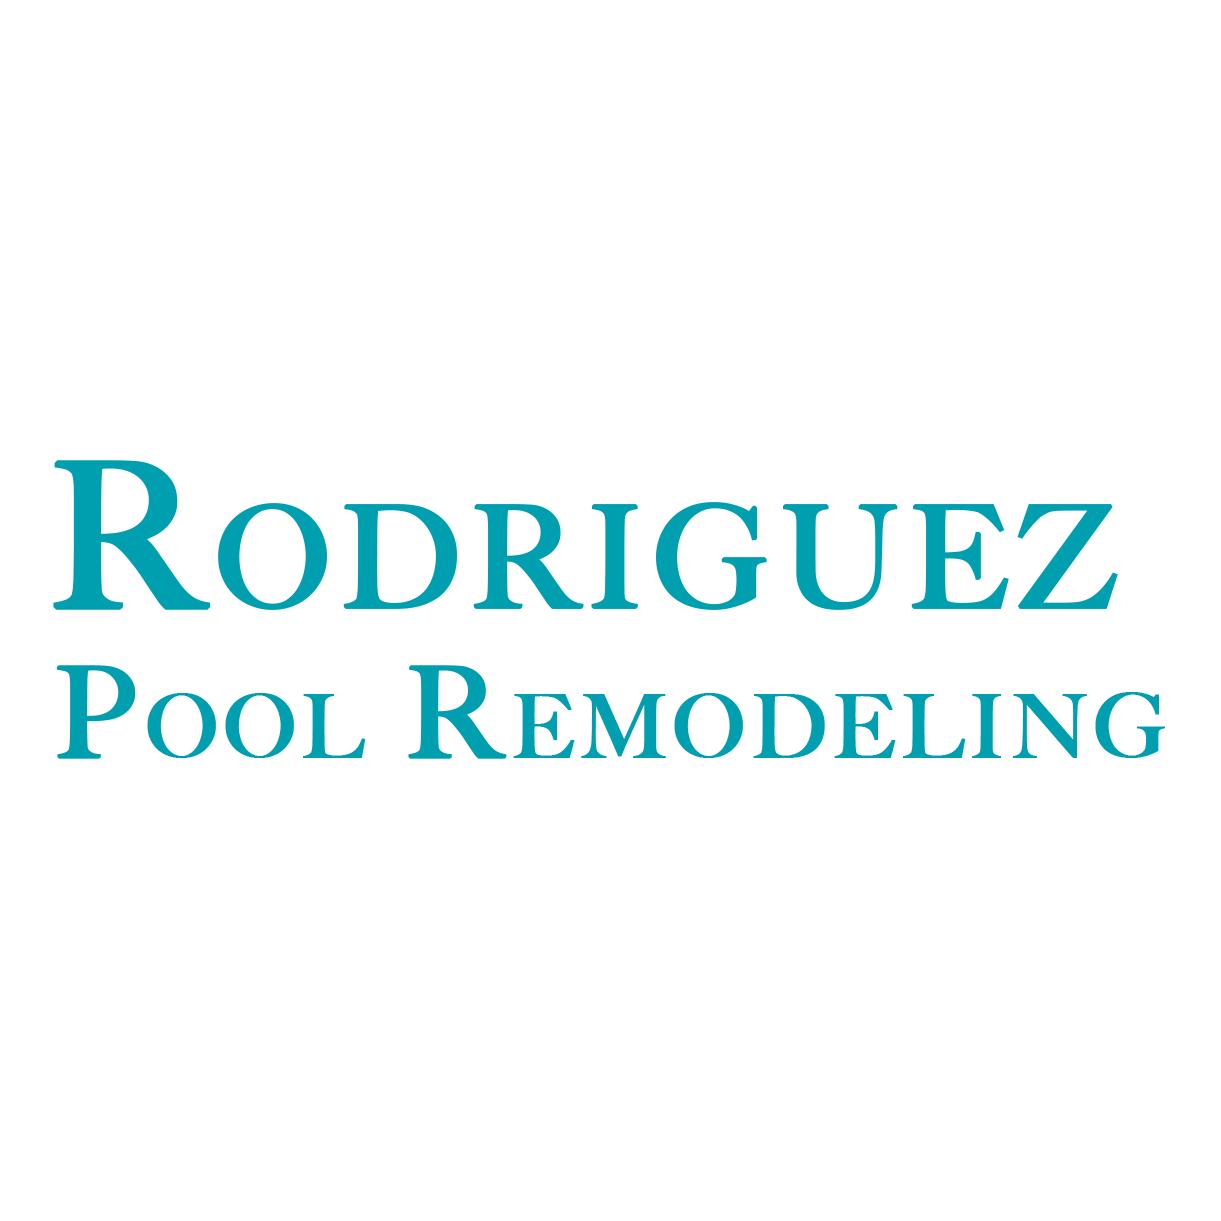 Rodriguez Pool Remodeling